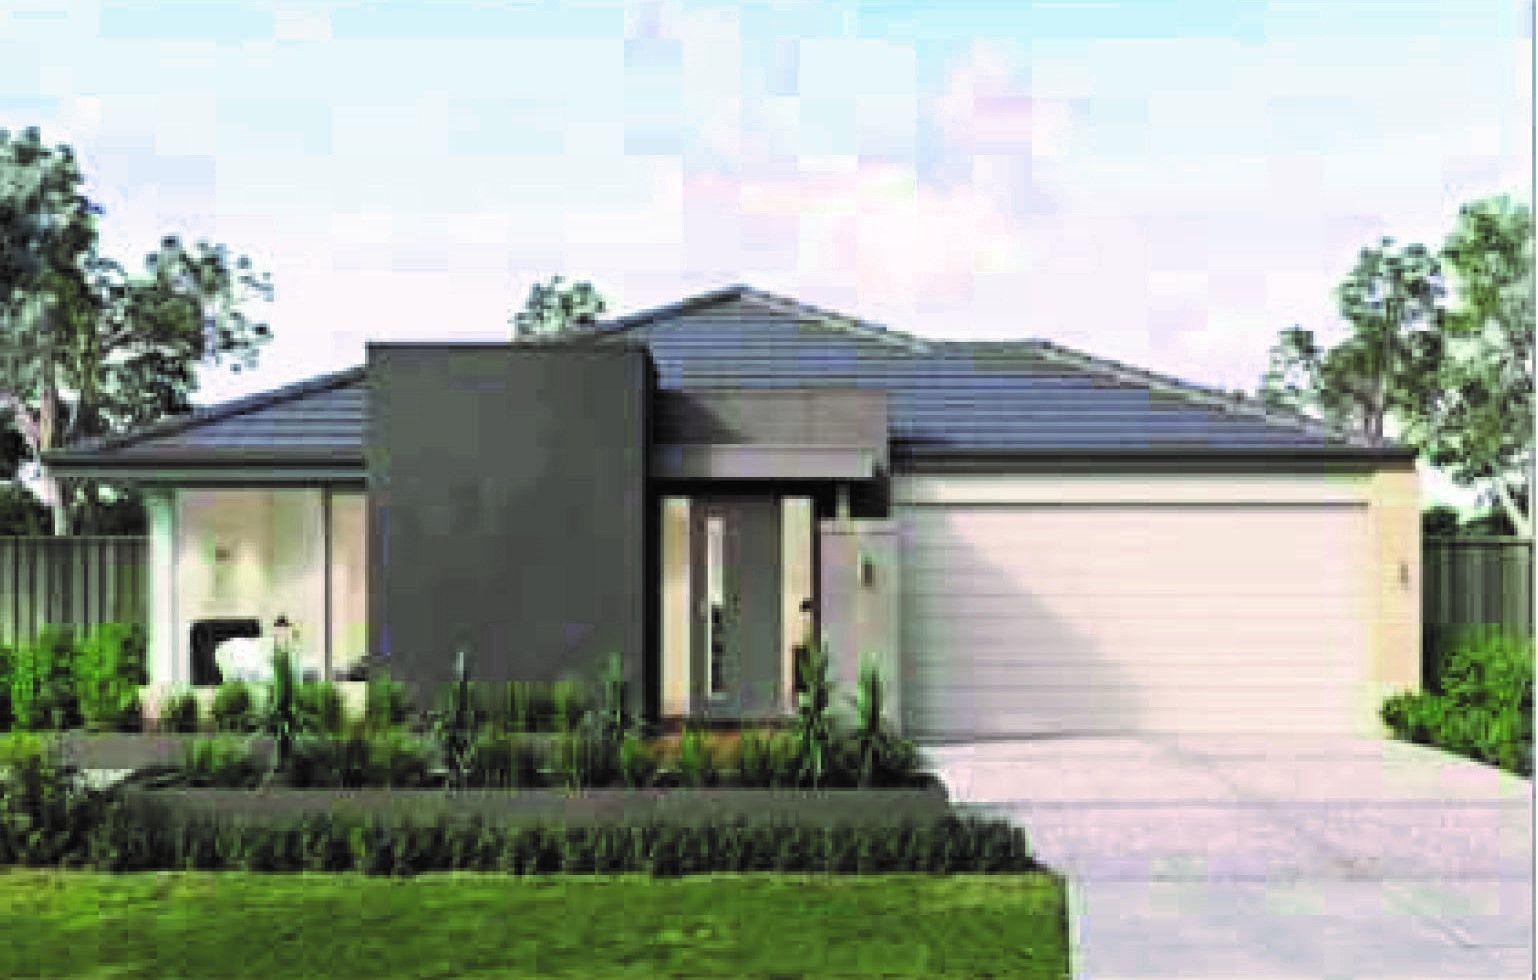 Lot 874 Shipwright Street, Cooranbong NSW 2265, Image 0